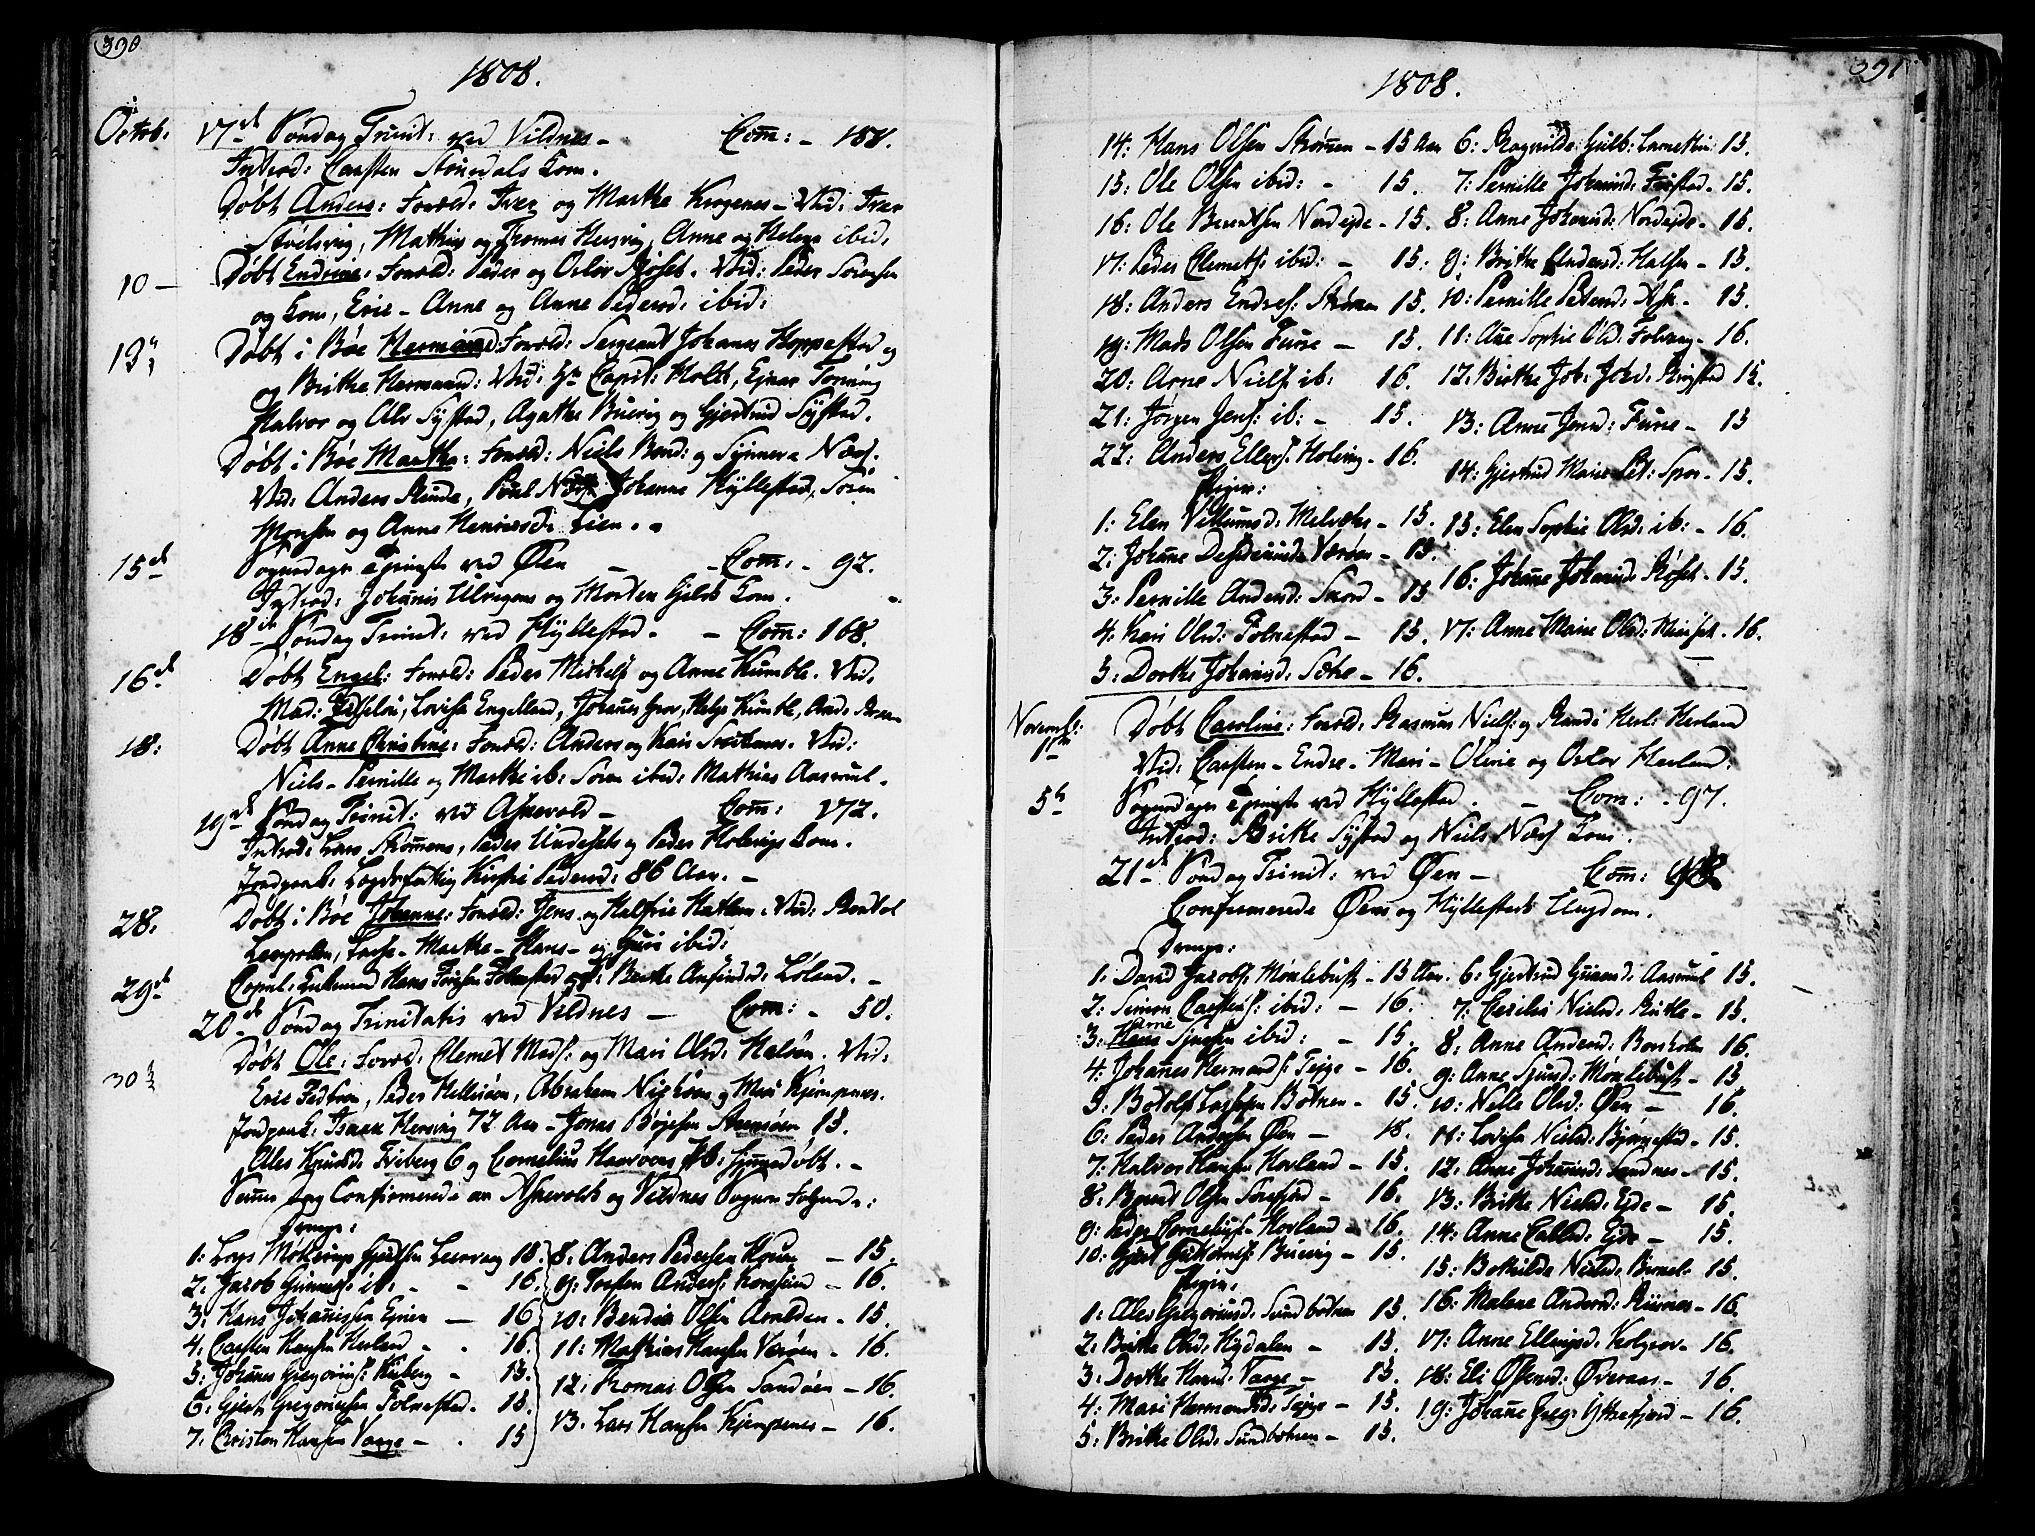 SAB, Askvoll sokneprestembete, H/Haa/Haaa/L0009: Ministerialbok nr. A 9, 1776-1821, s. 390-391